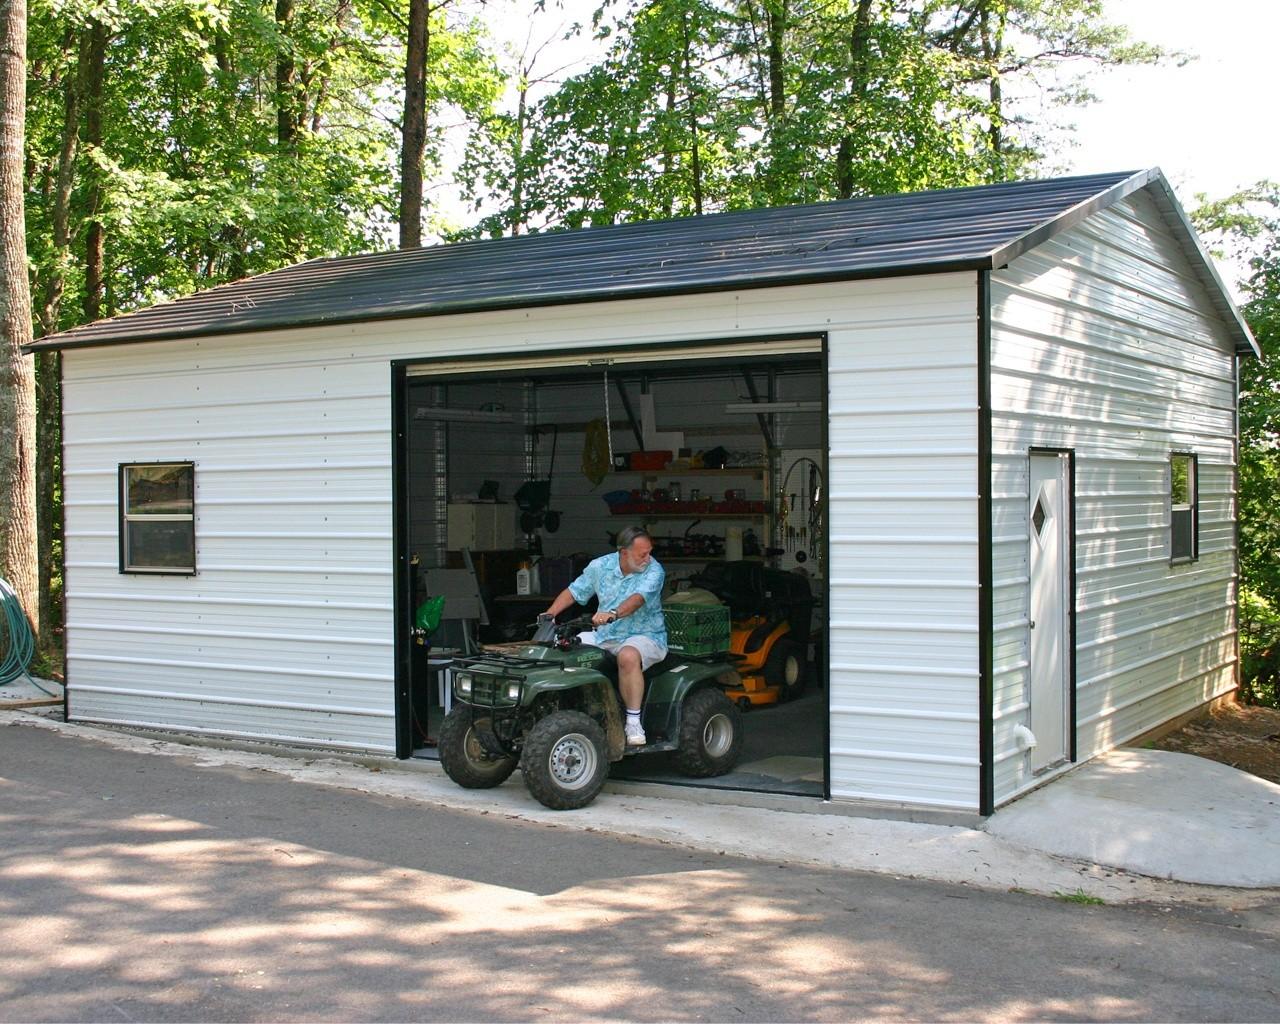 гараж для квадроцикла дачный